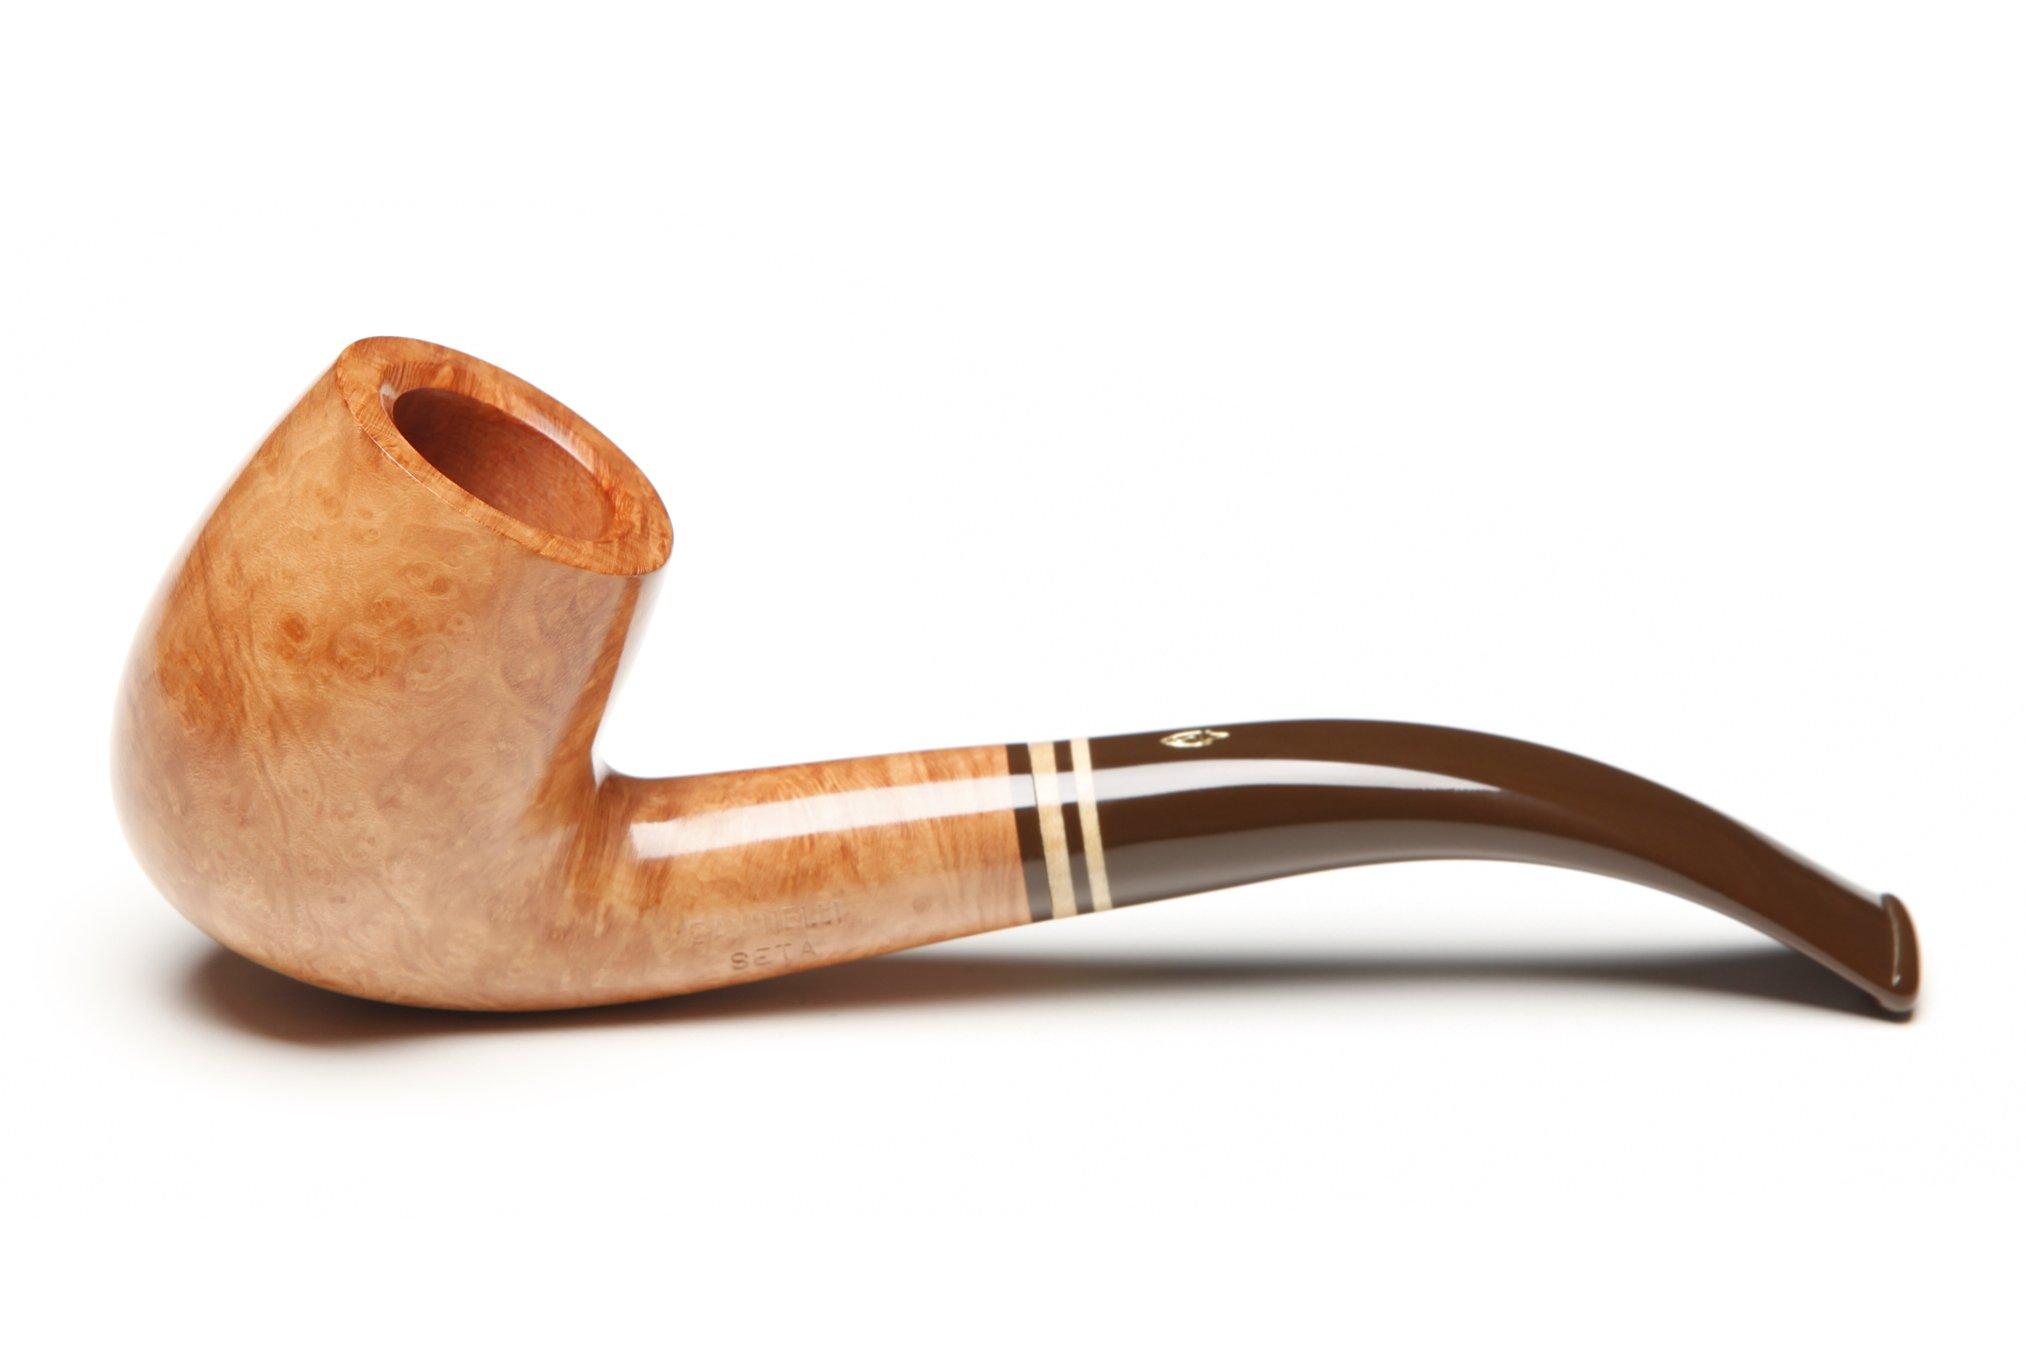 Savinelli Seta Smooth 606 KS Natural Tobacco Pipe by Savinelli (Image #1)